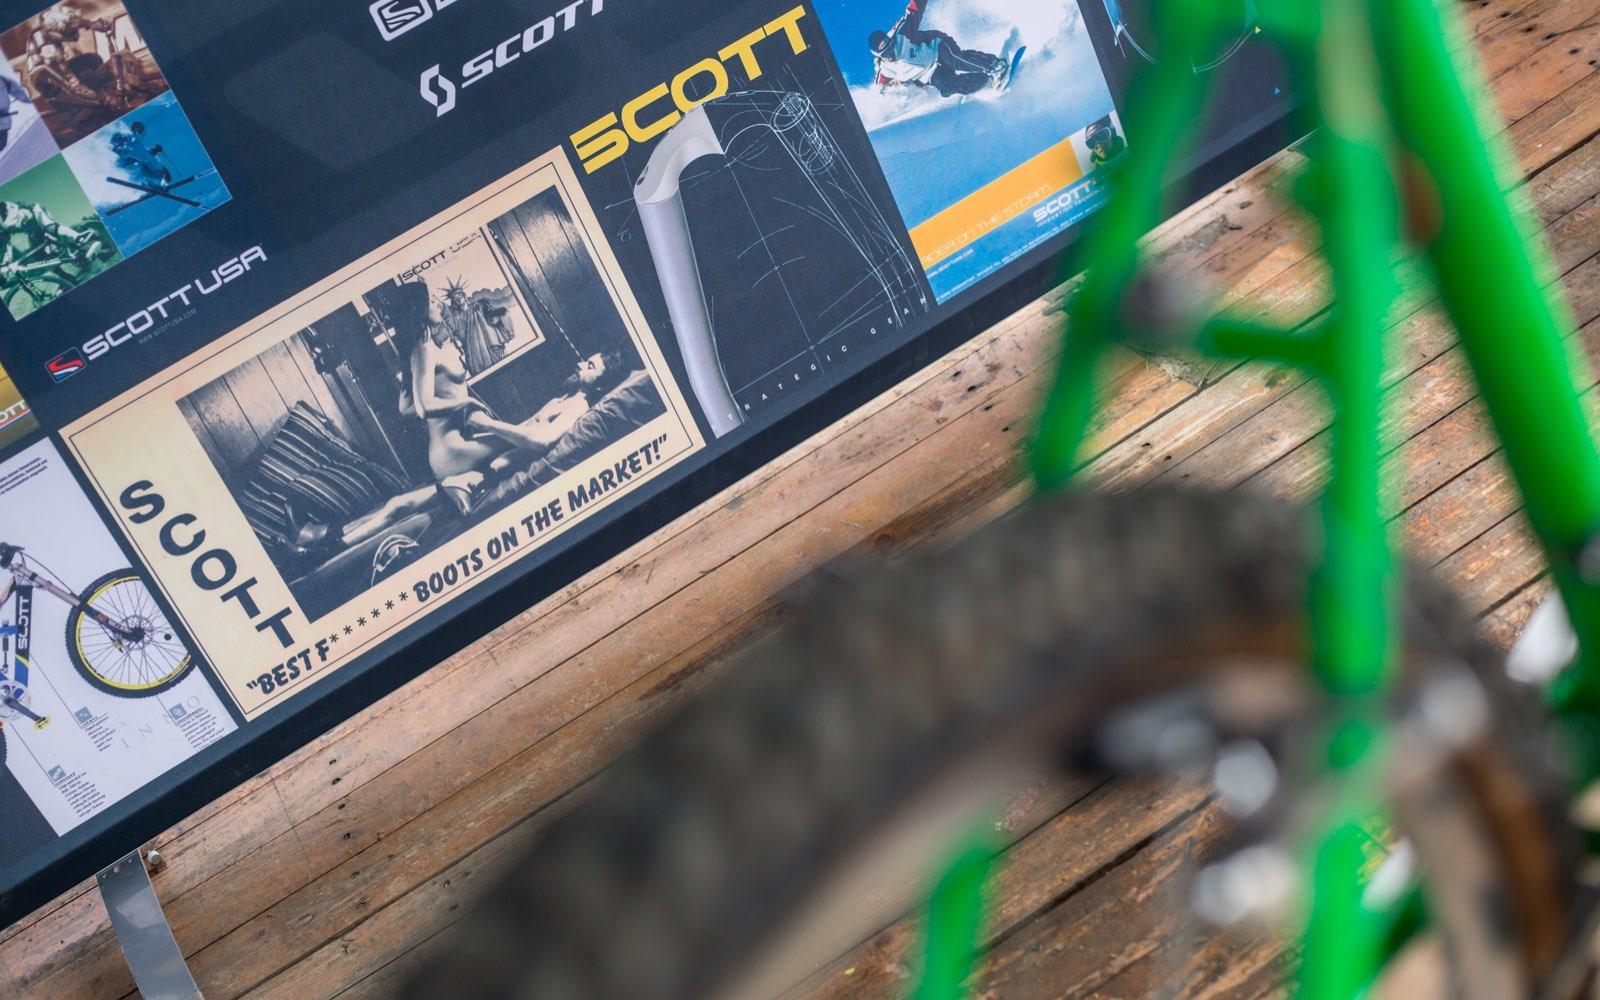 SCOTT Pro Racing